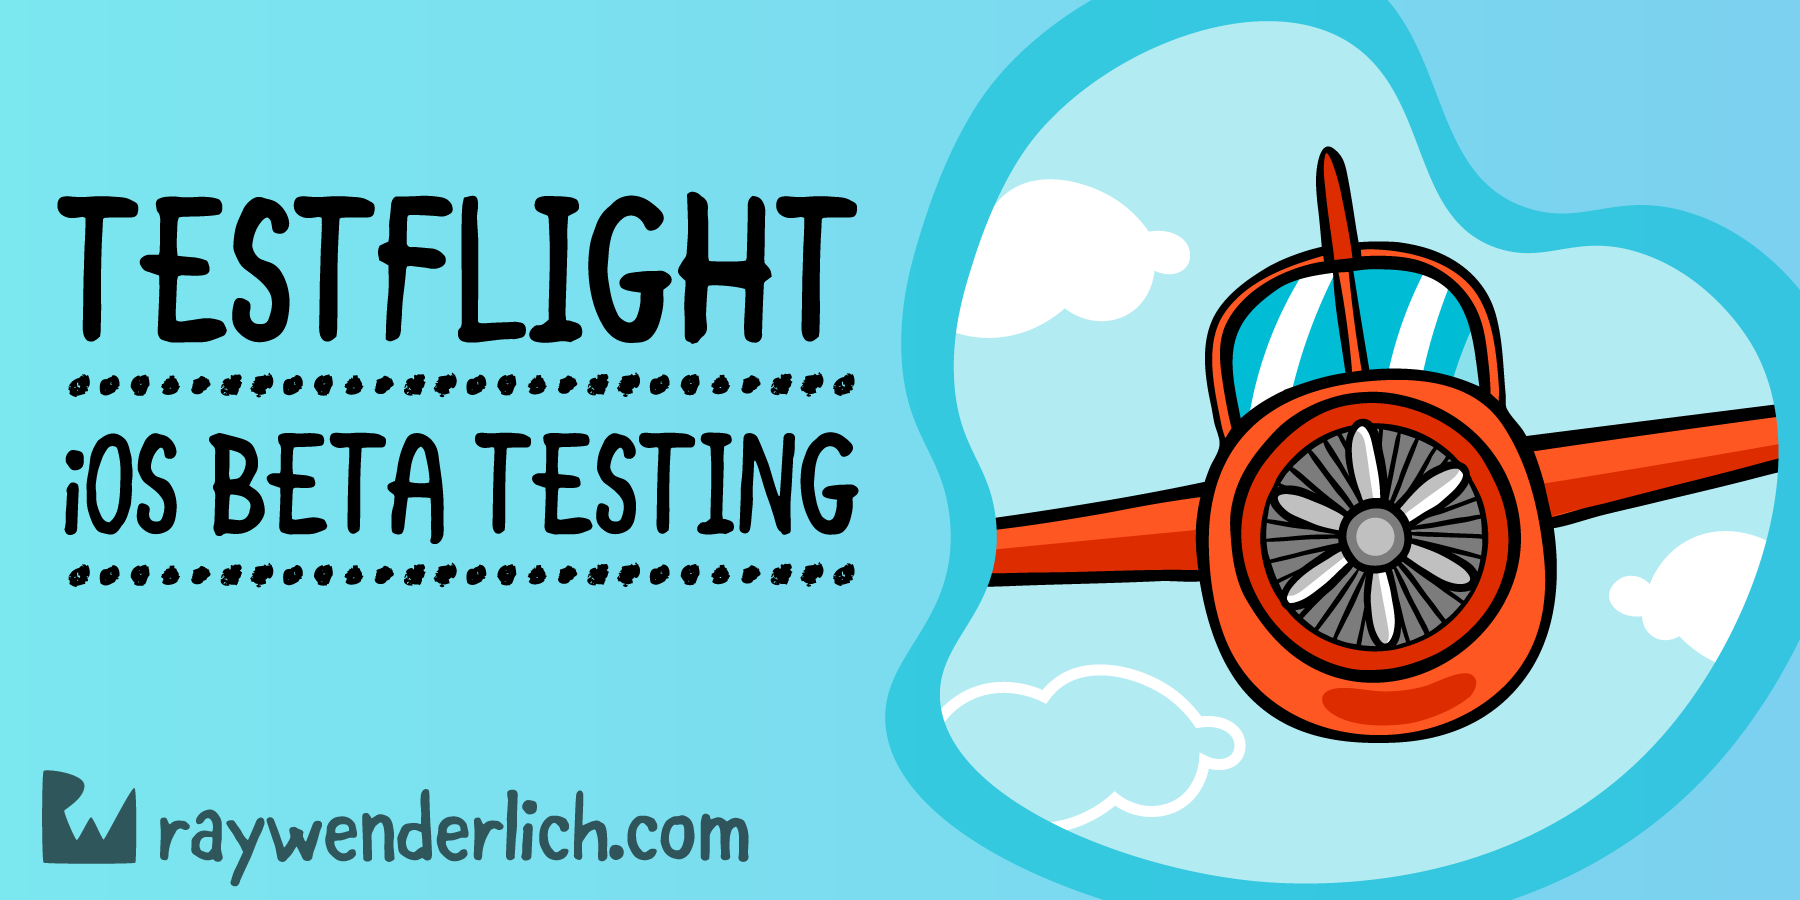 TestFlight Tutorial: iOS Beta Testing [FREE] - RapidAPI